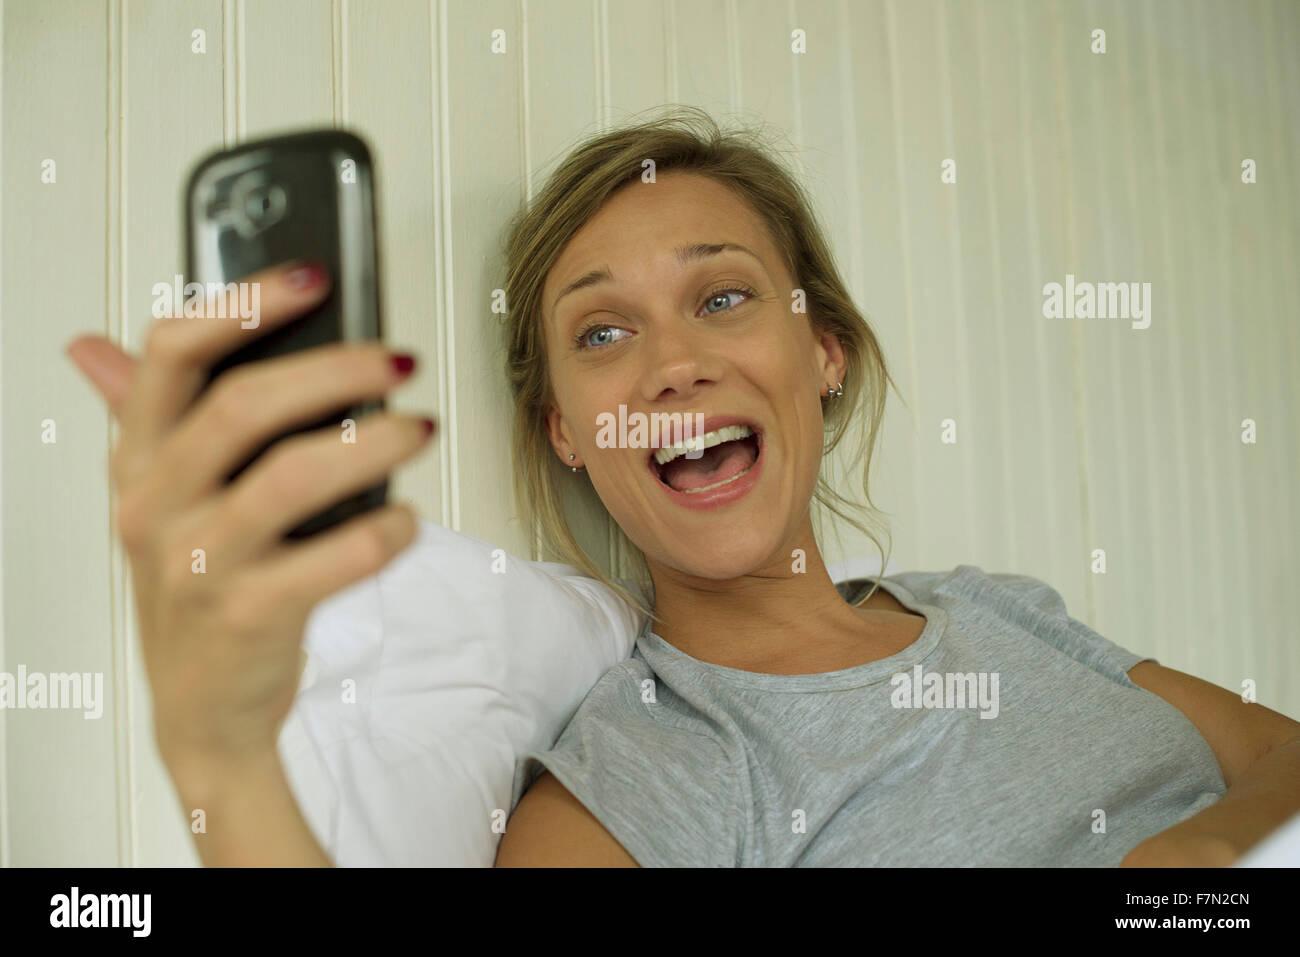 Donna sorridente, tenendo selfie Immagini Stock